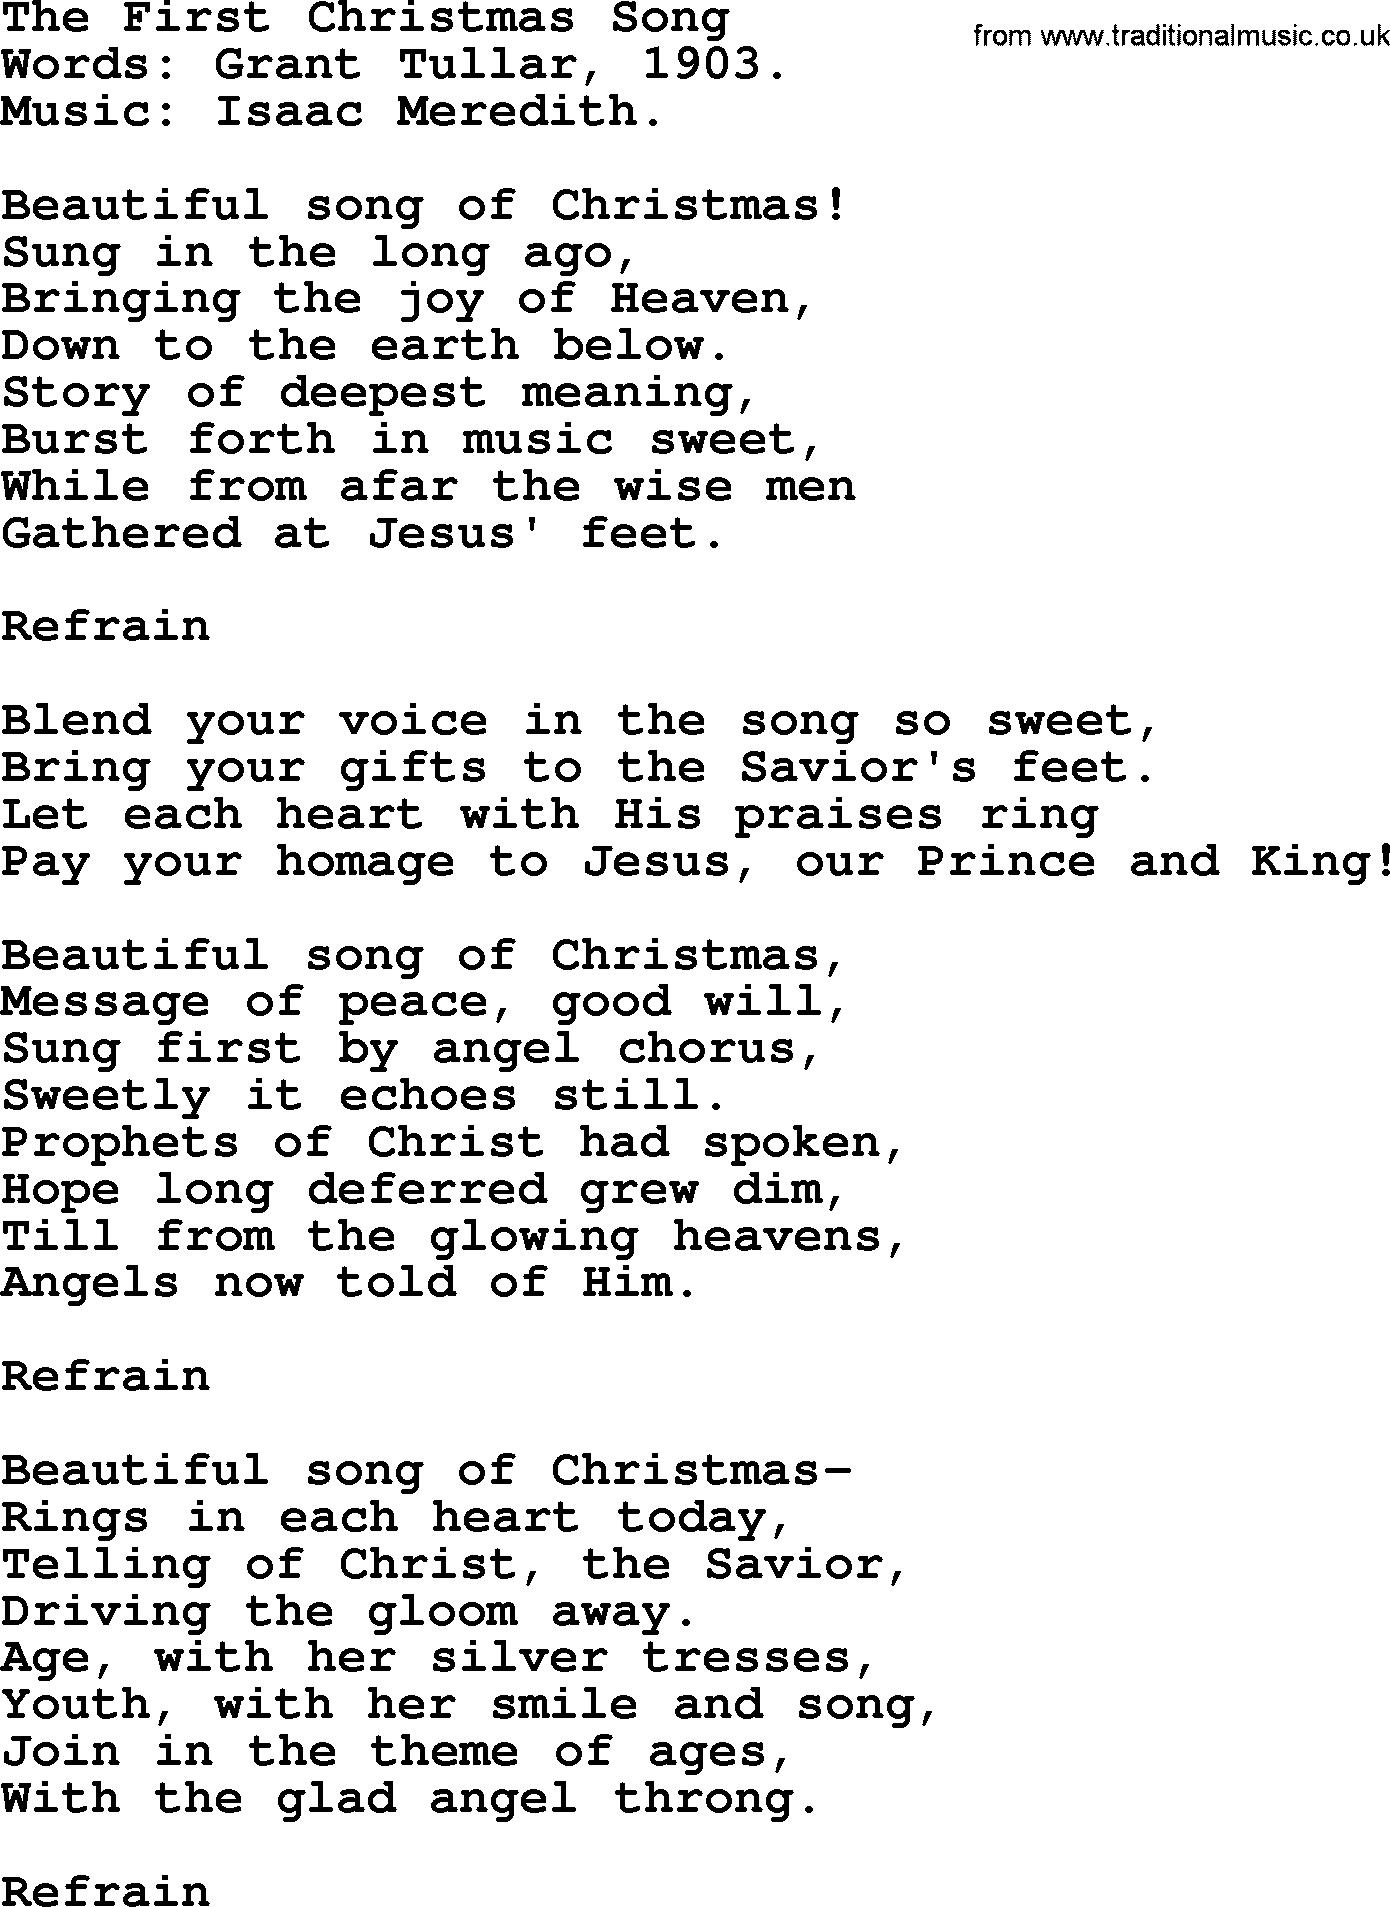 Download Christmas Songs The First Noel - Lagu 24